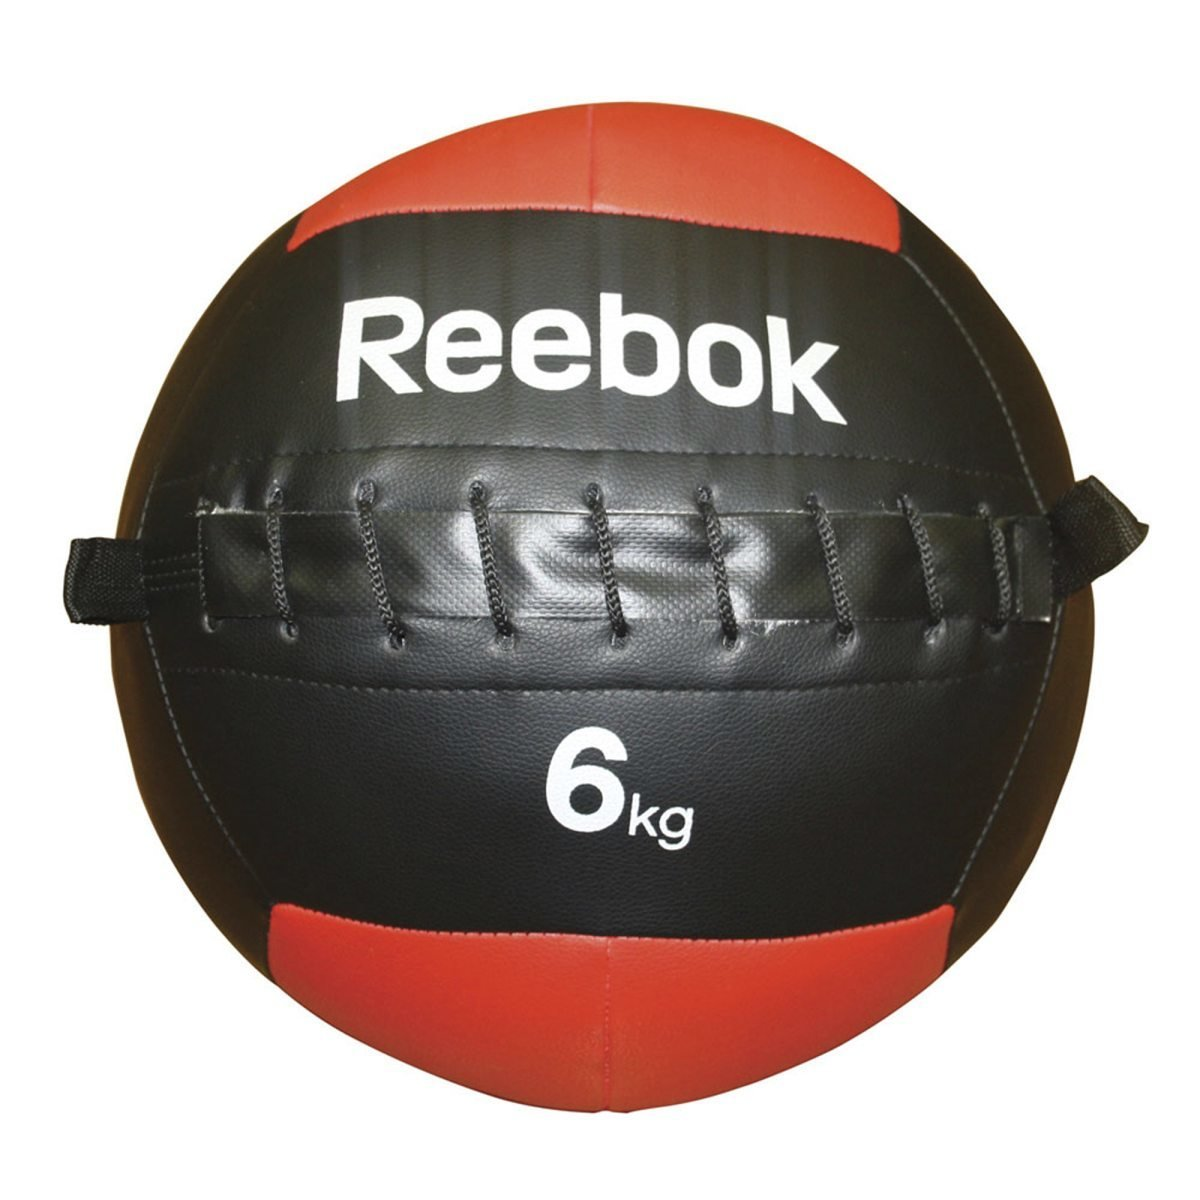 Reebok Studio Softball 12kg